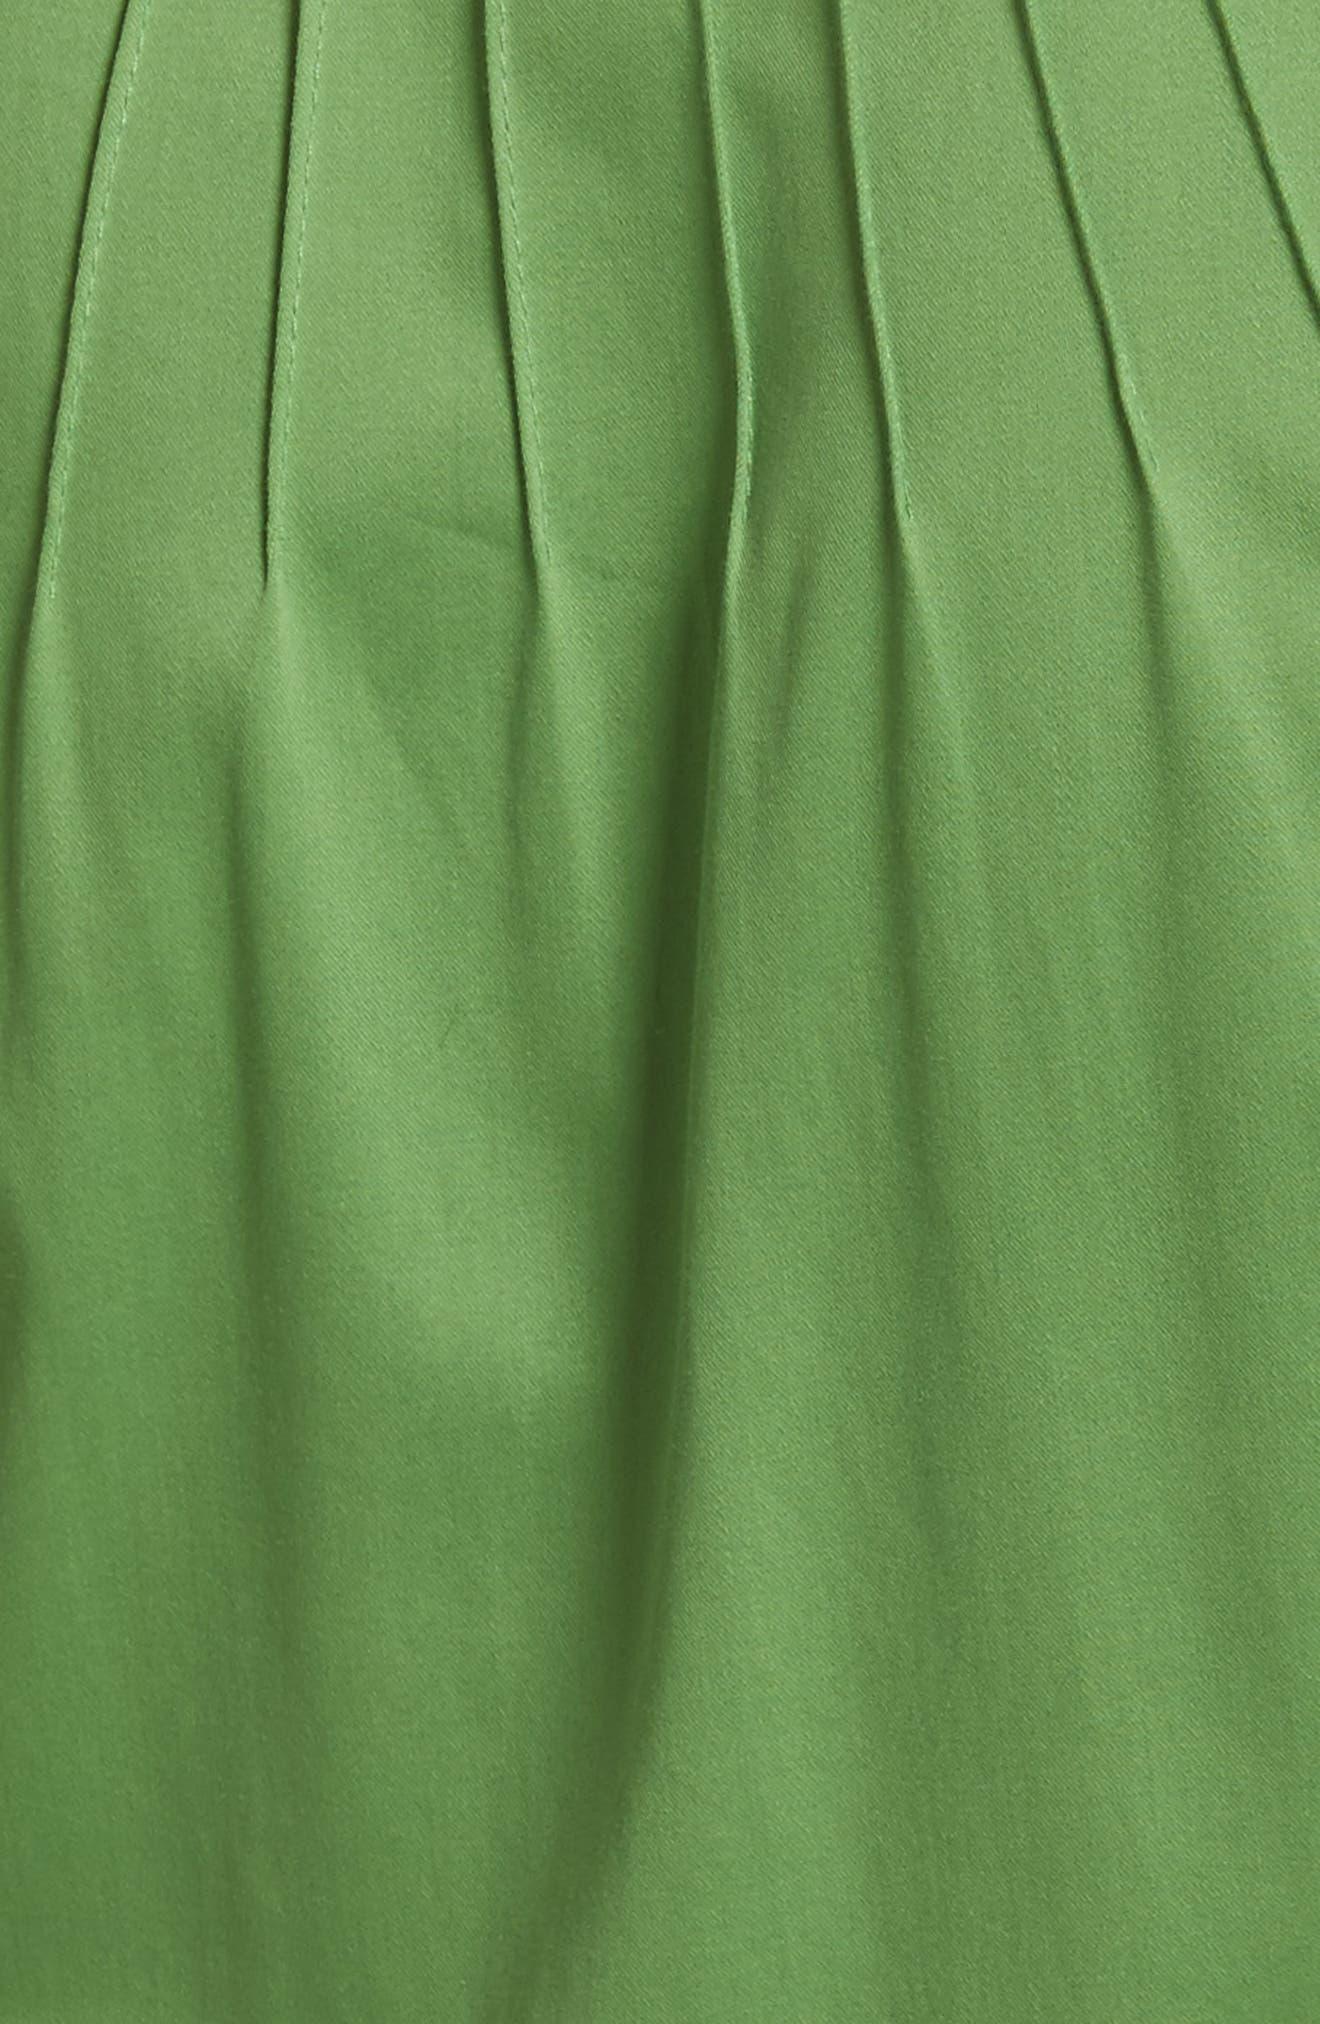 Diane von Furstenberg Pintuck Dress,                             Alternate thumbnail 5, color,                             315